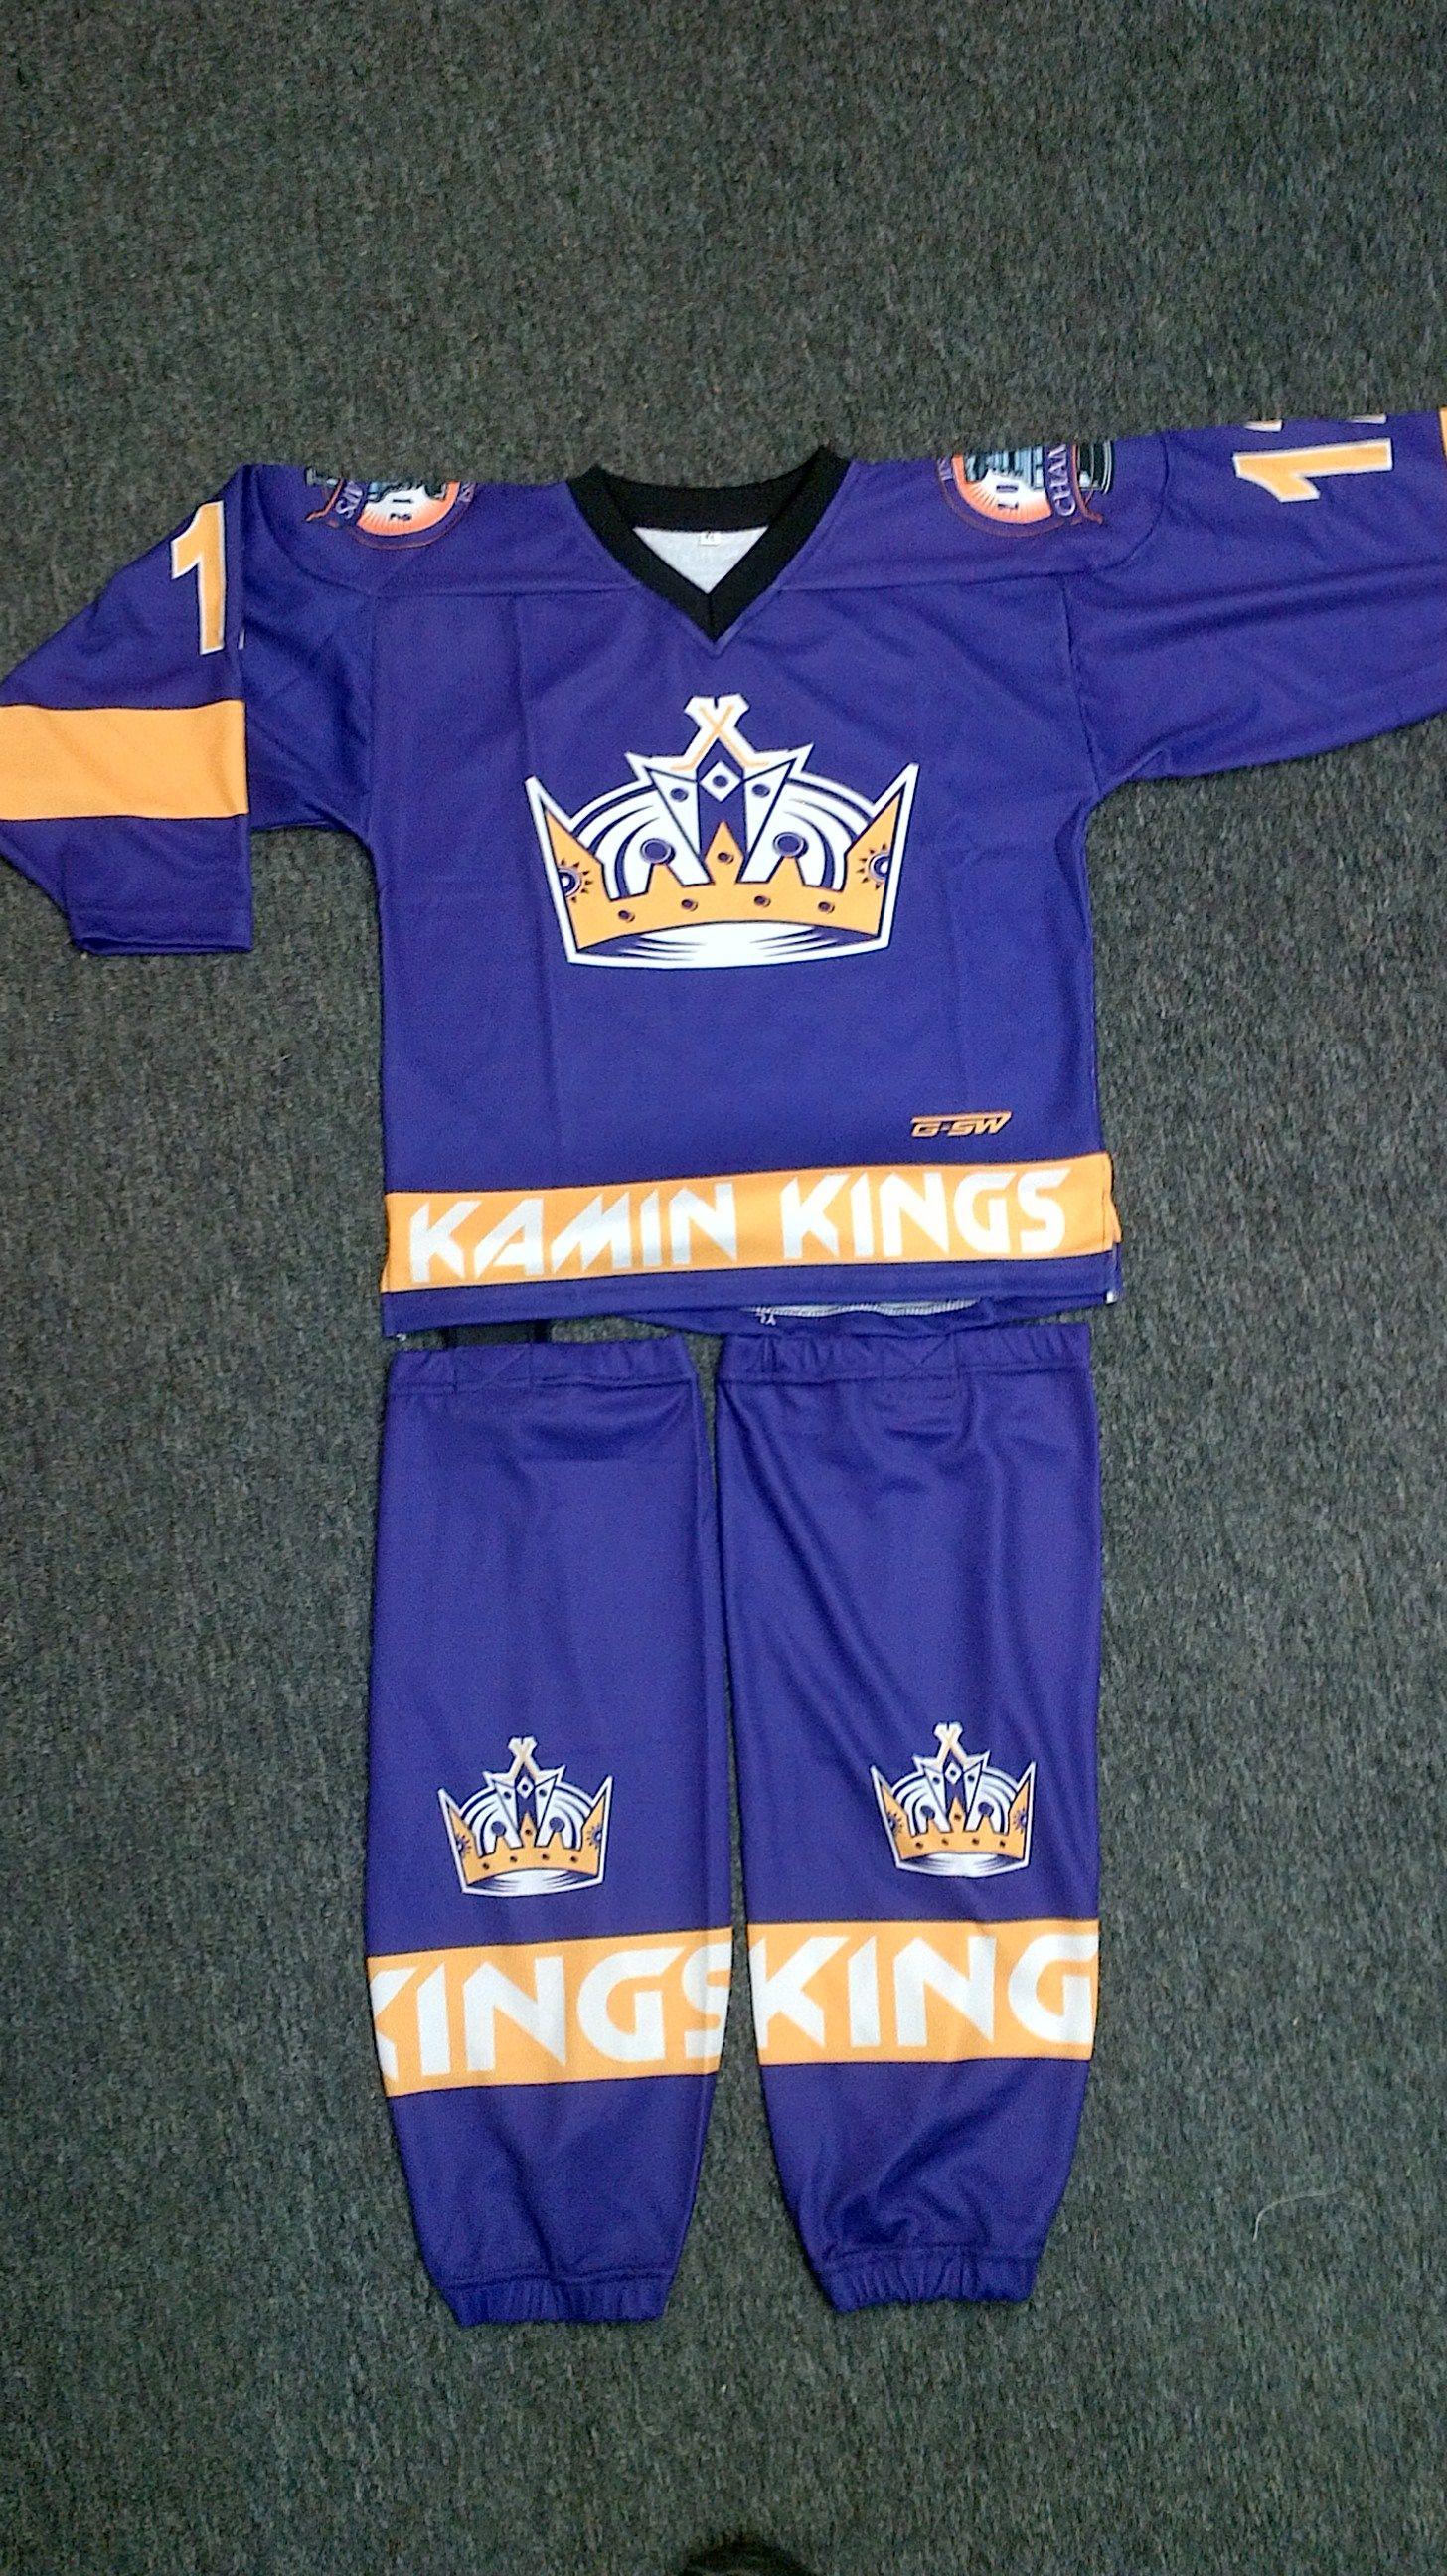 Custom sublimated uniform for the Kamin Kings  0960aca40